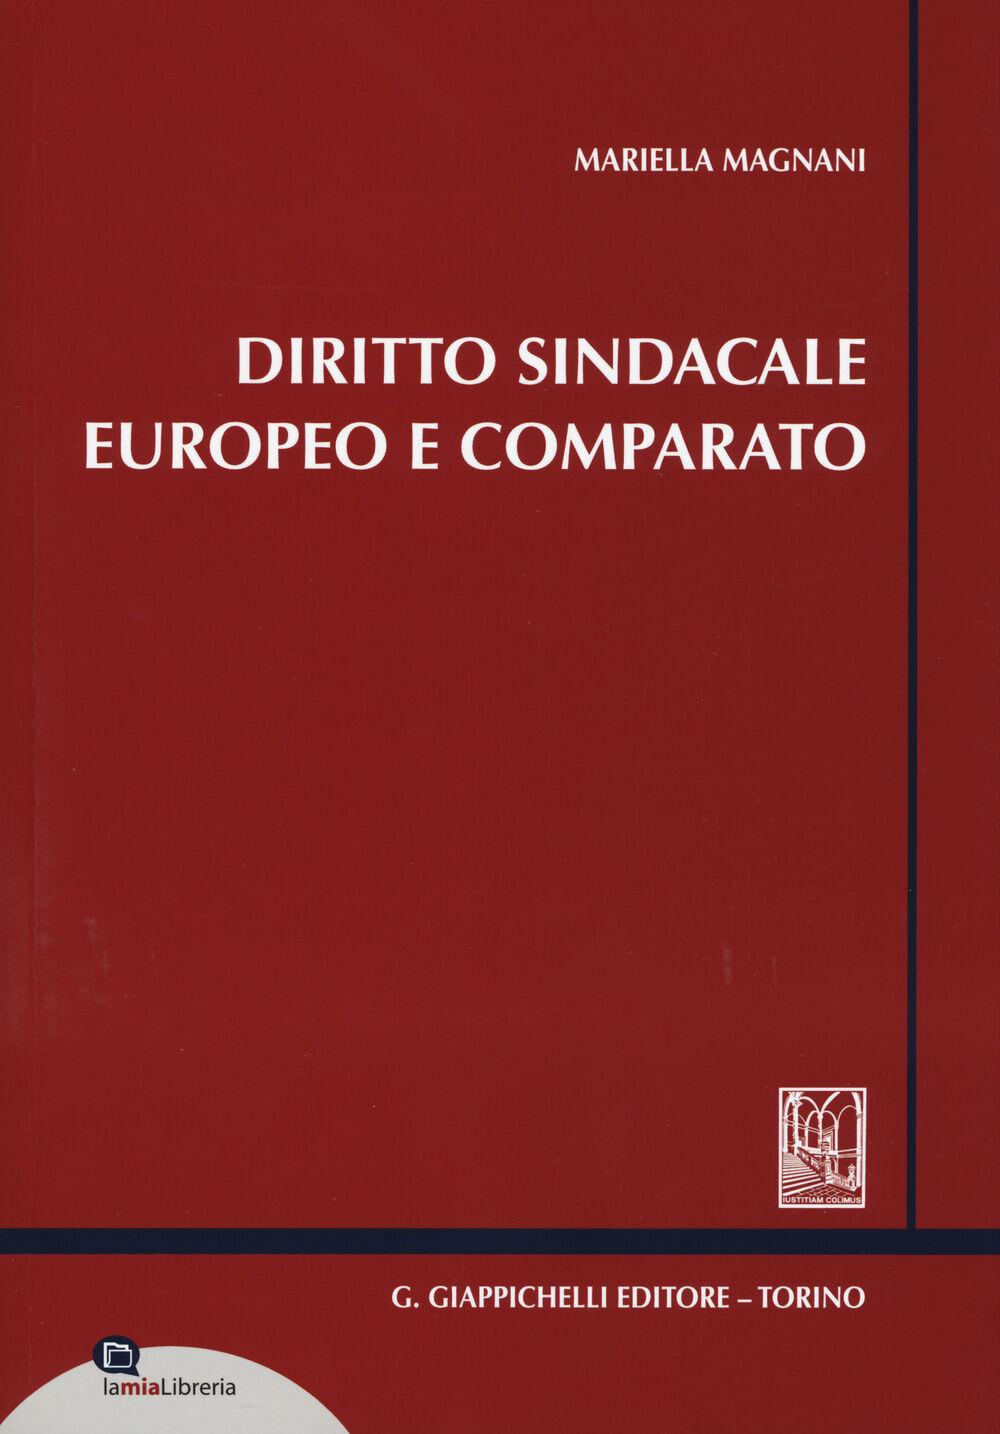 Diritto sindacale europeo e comparato